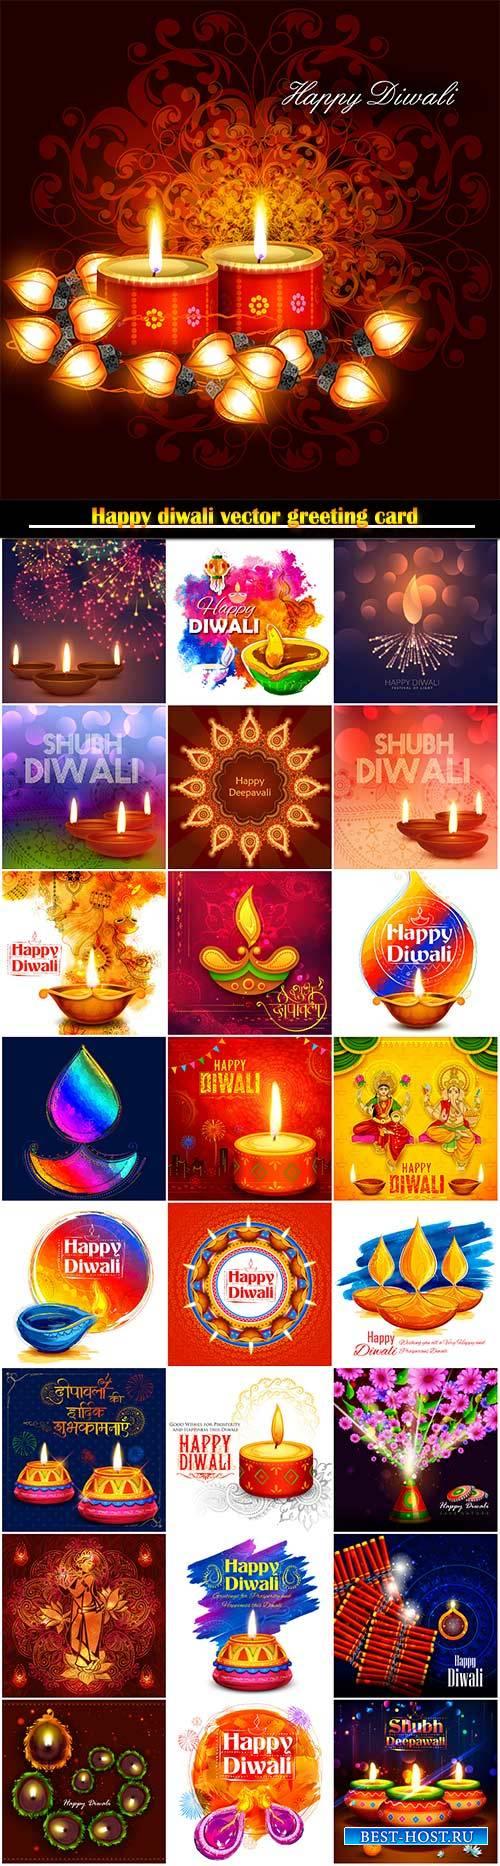 Happy diwali vector greeting card